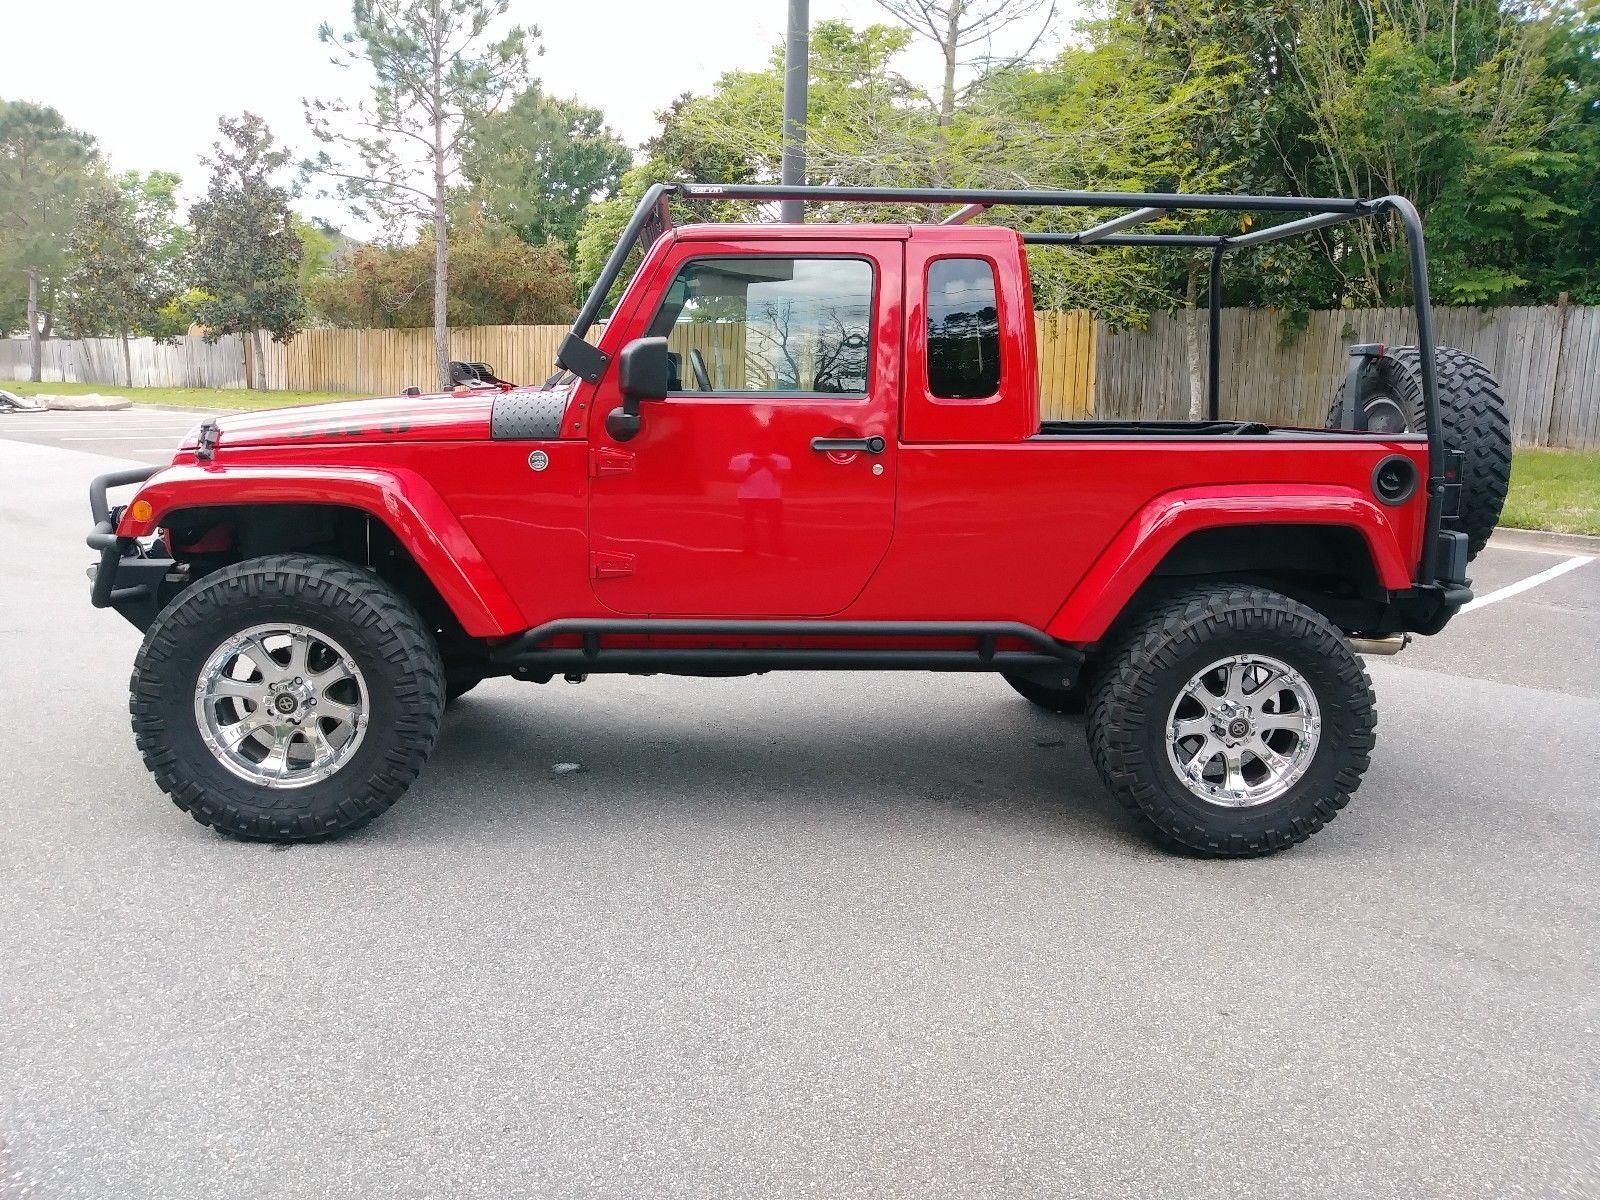 2012 Jeep Wrangler JK8 JK 8